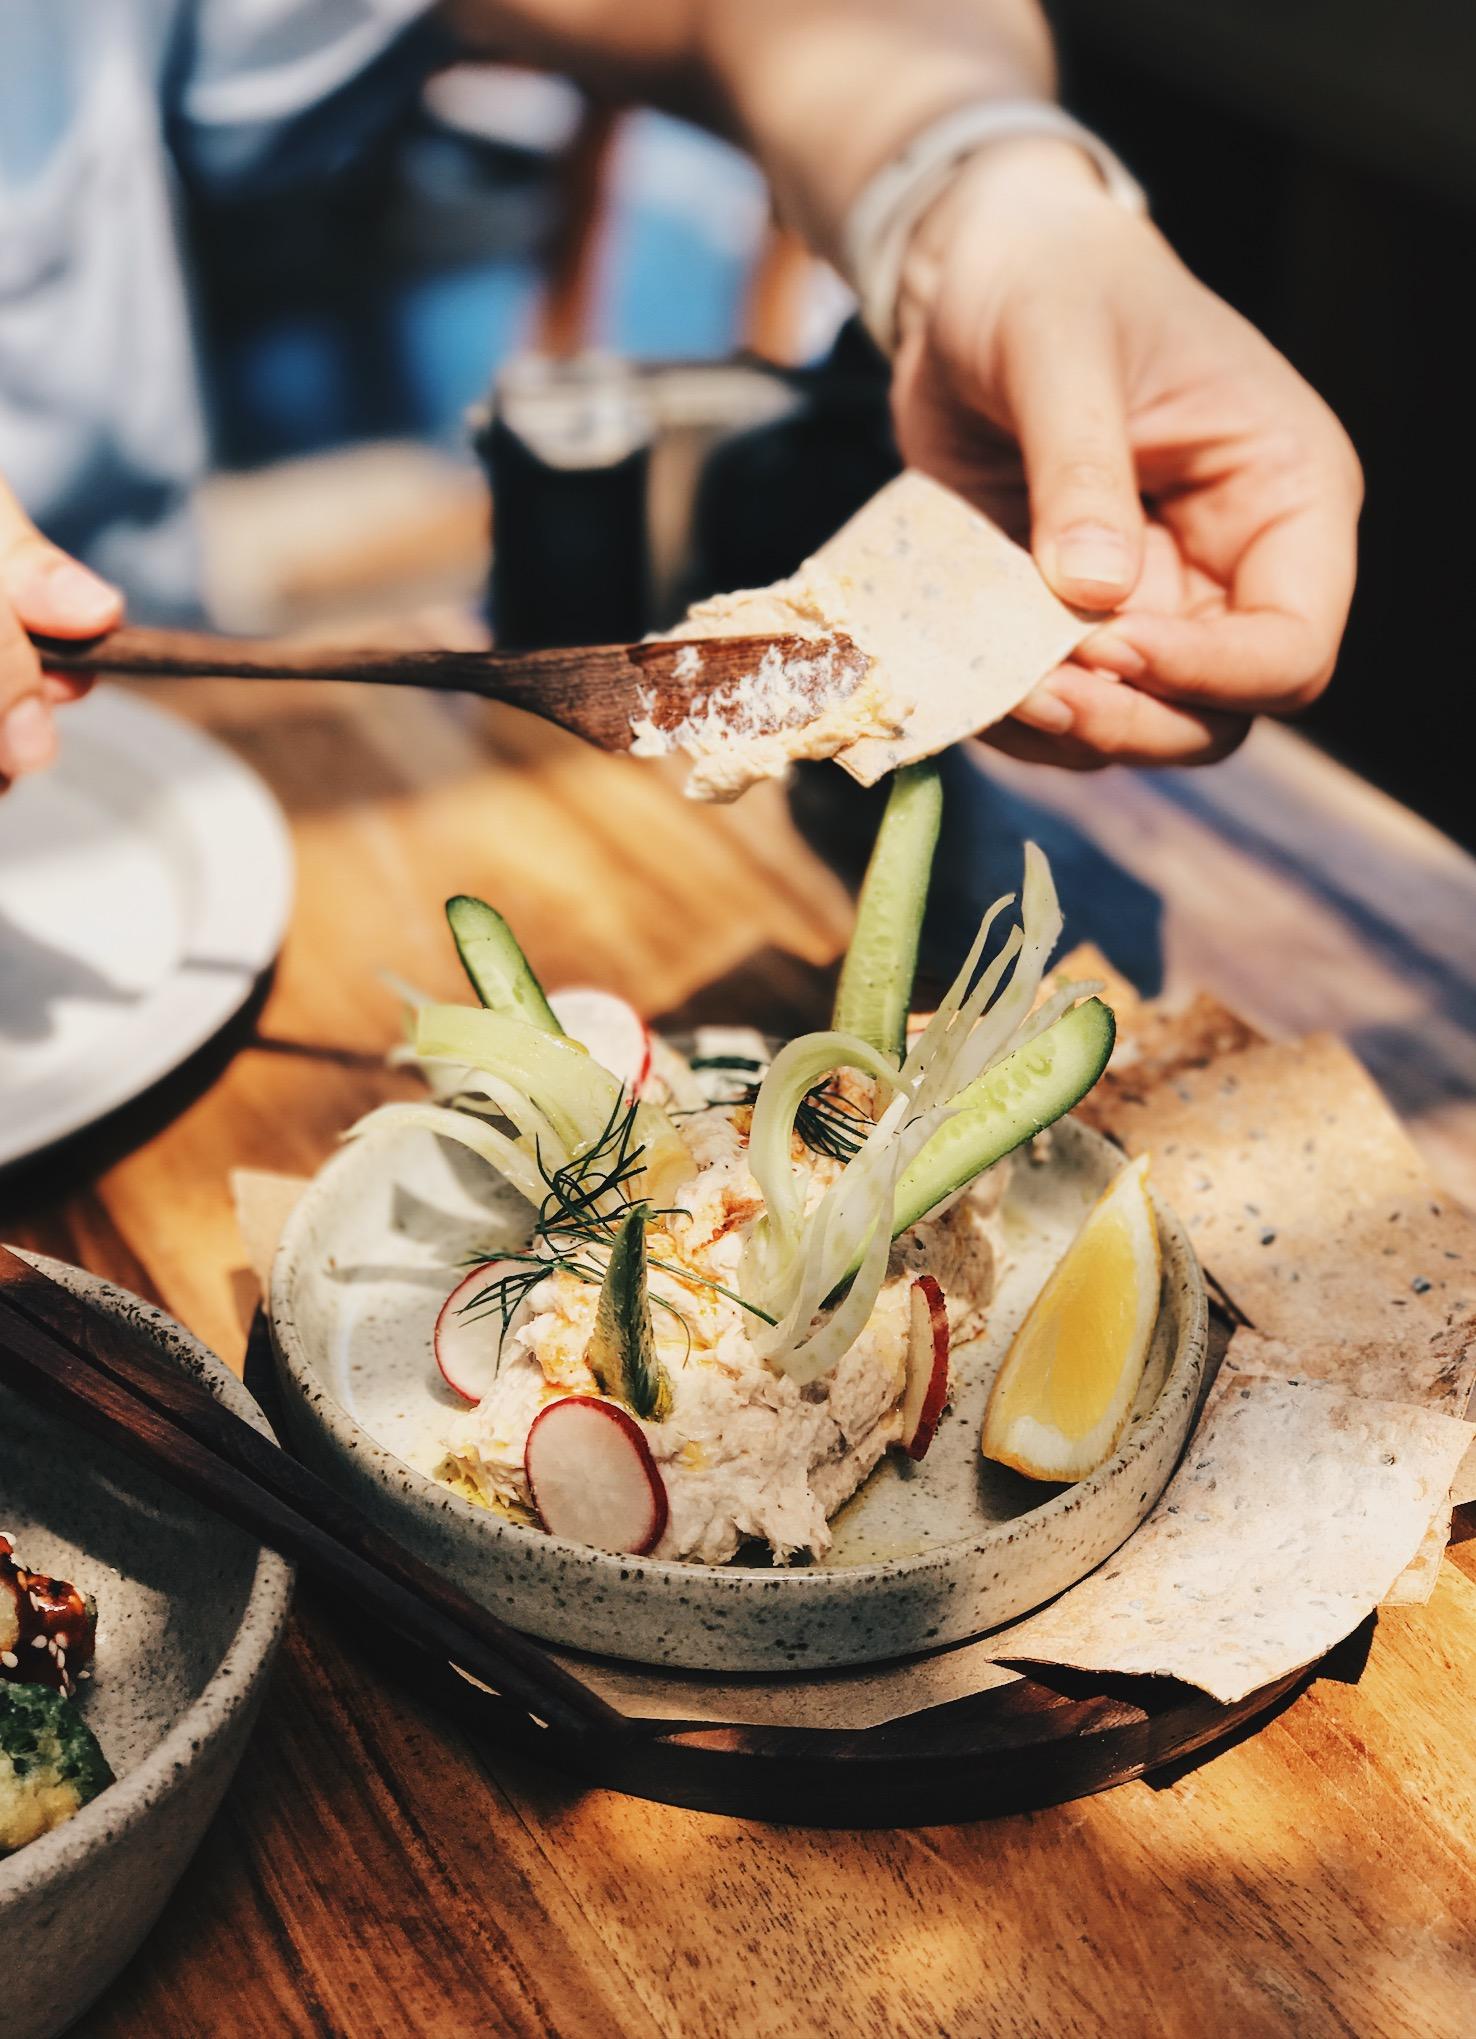 Fish Dip - Smoked mahi-mahi, fennel, radish, seed crackers